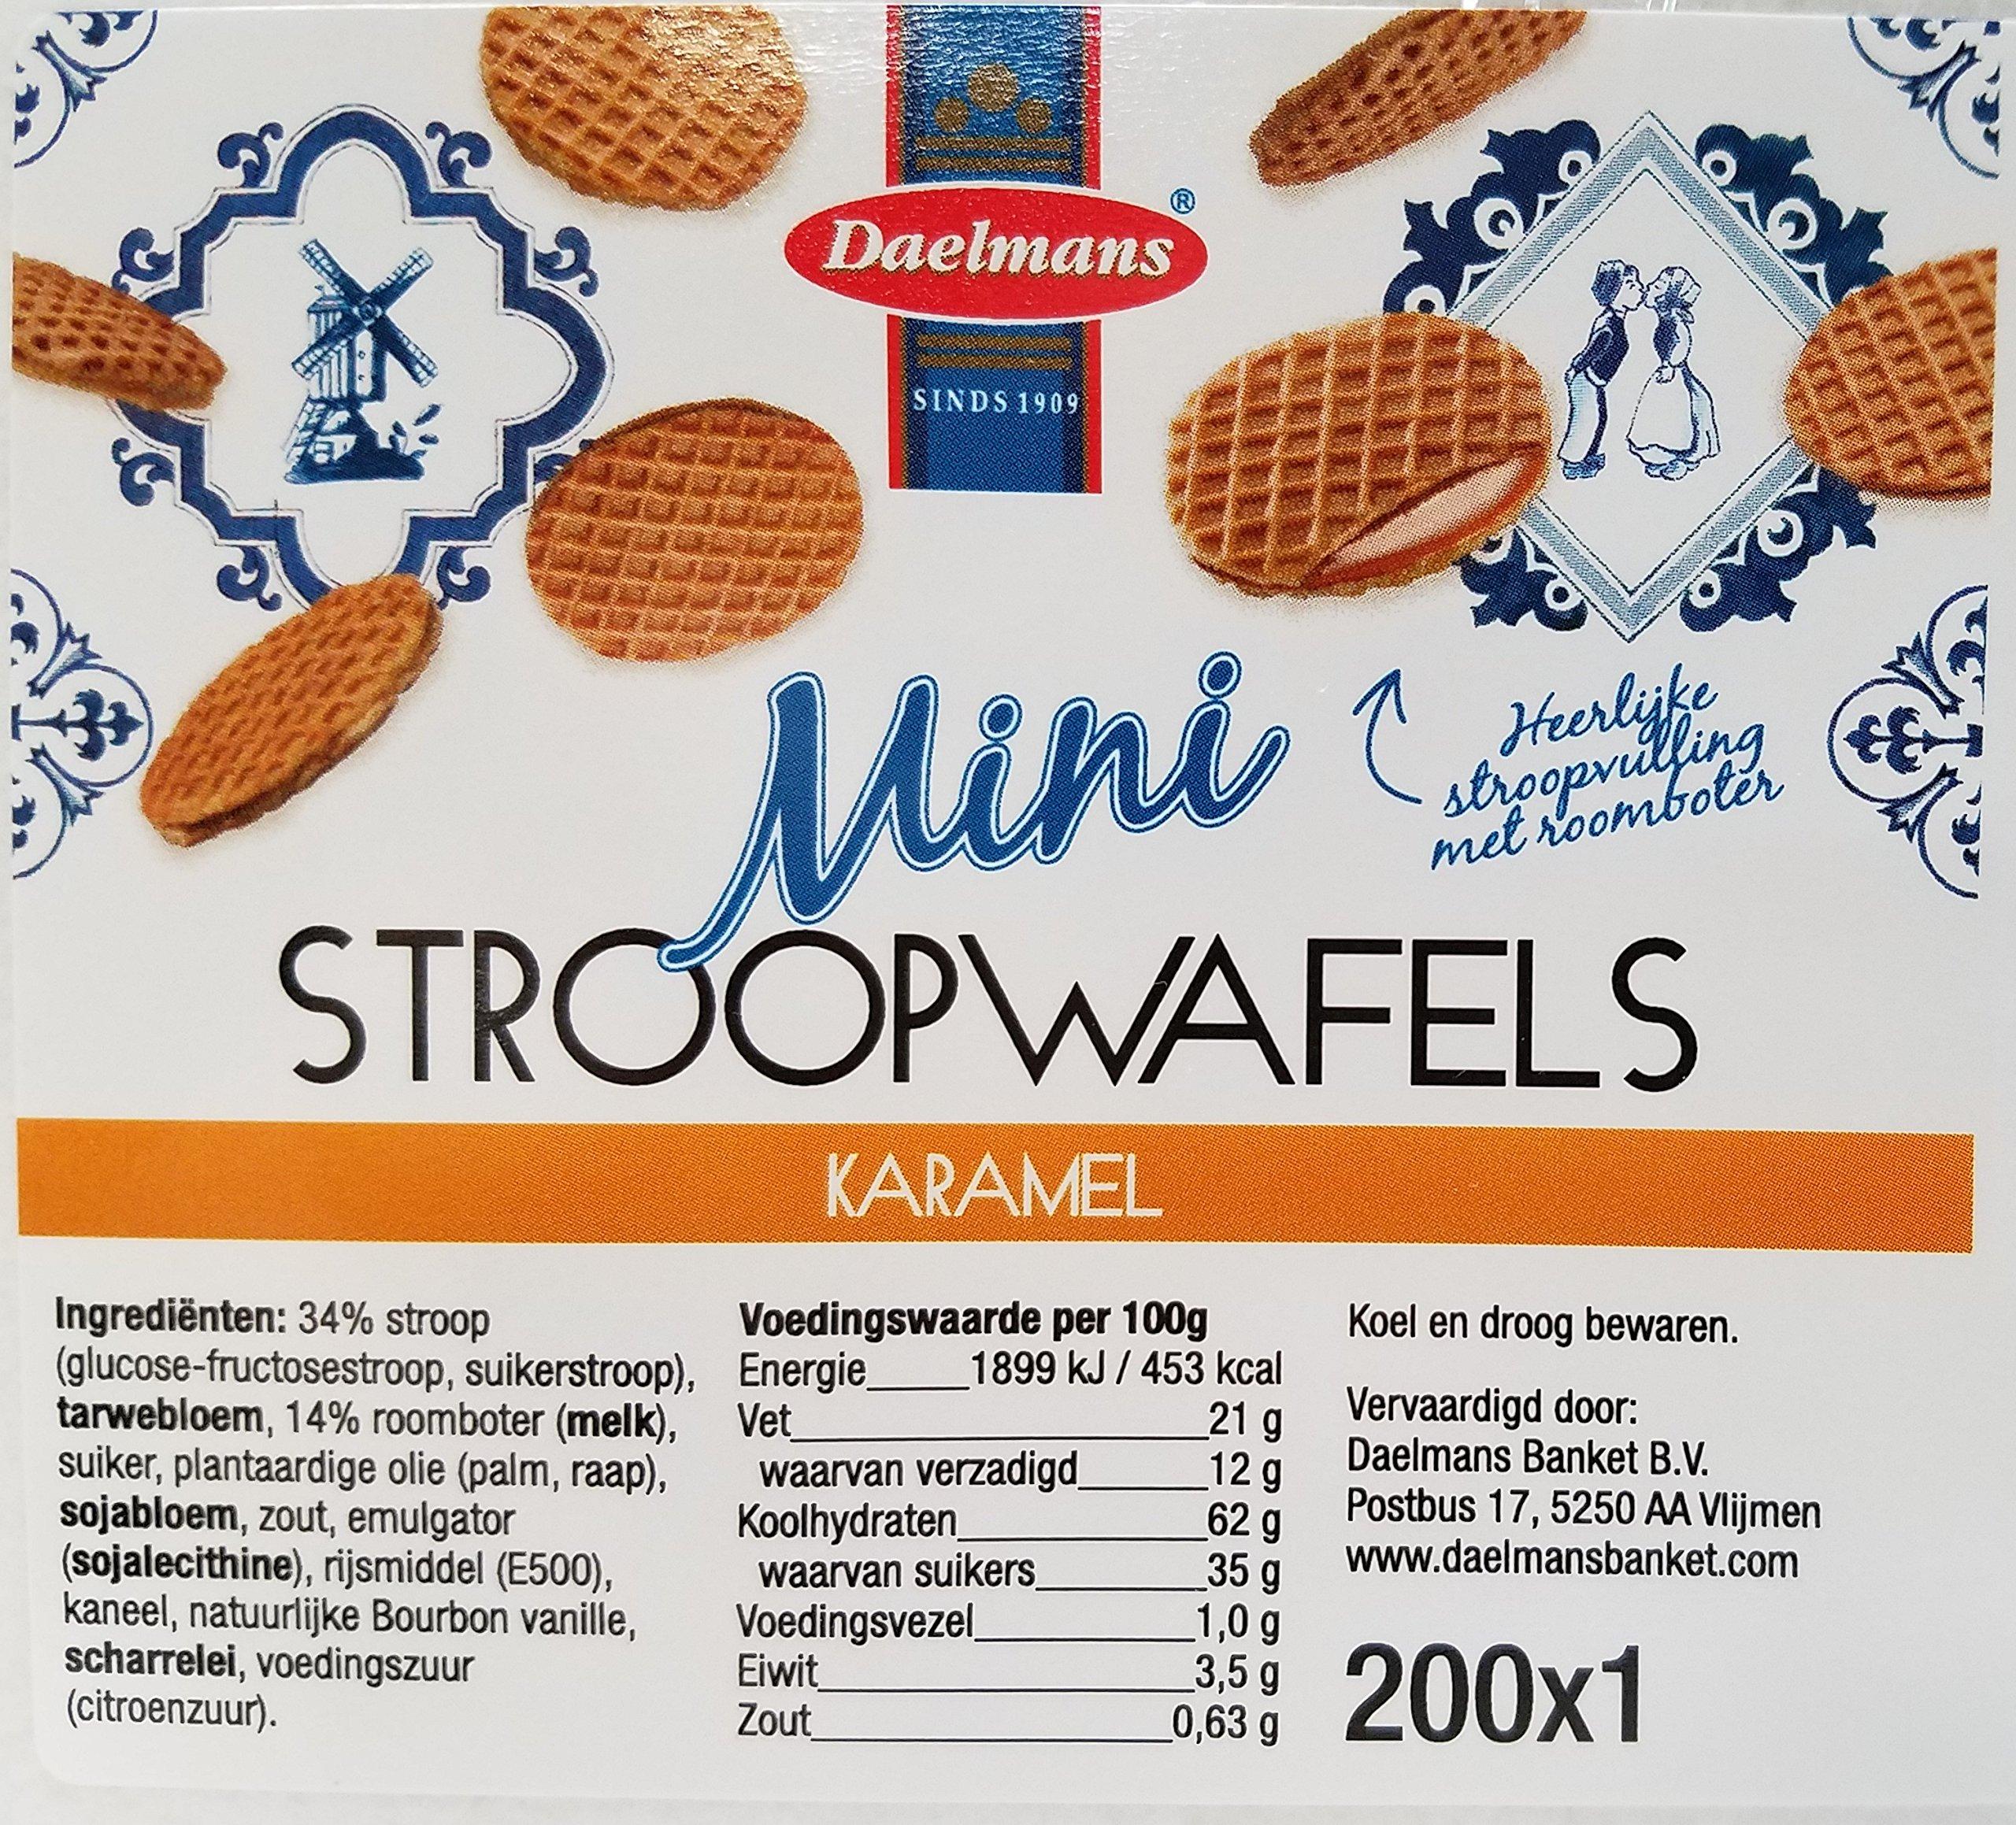 Daelmans Mini Caramel Wafer, 200ct Stroopfwafels